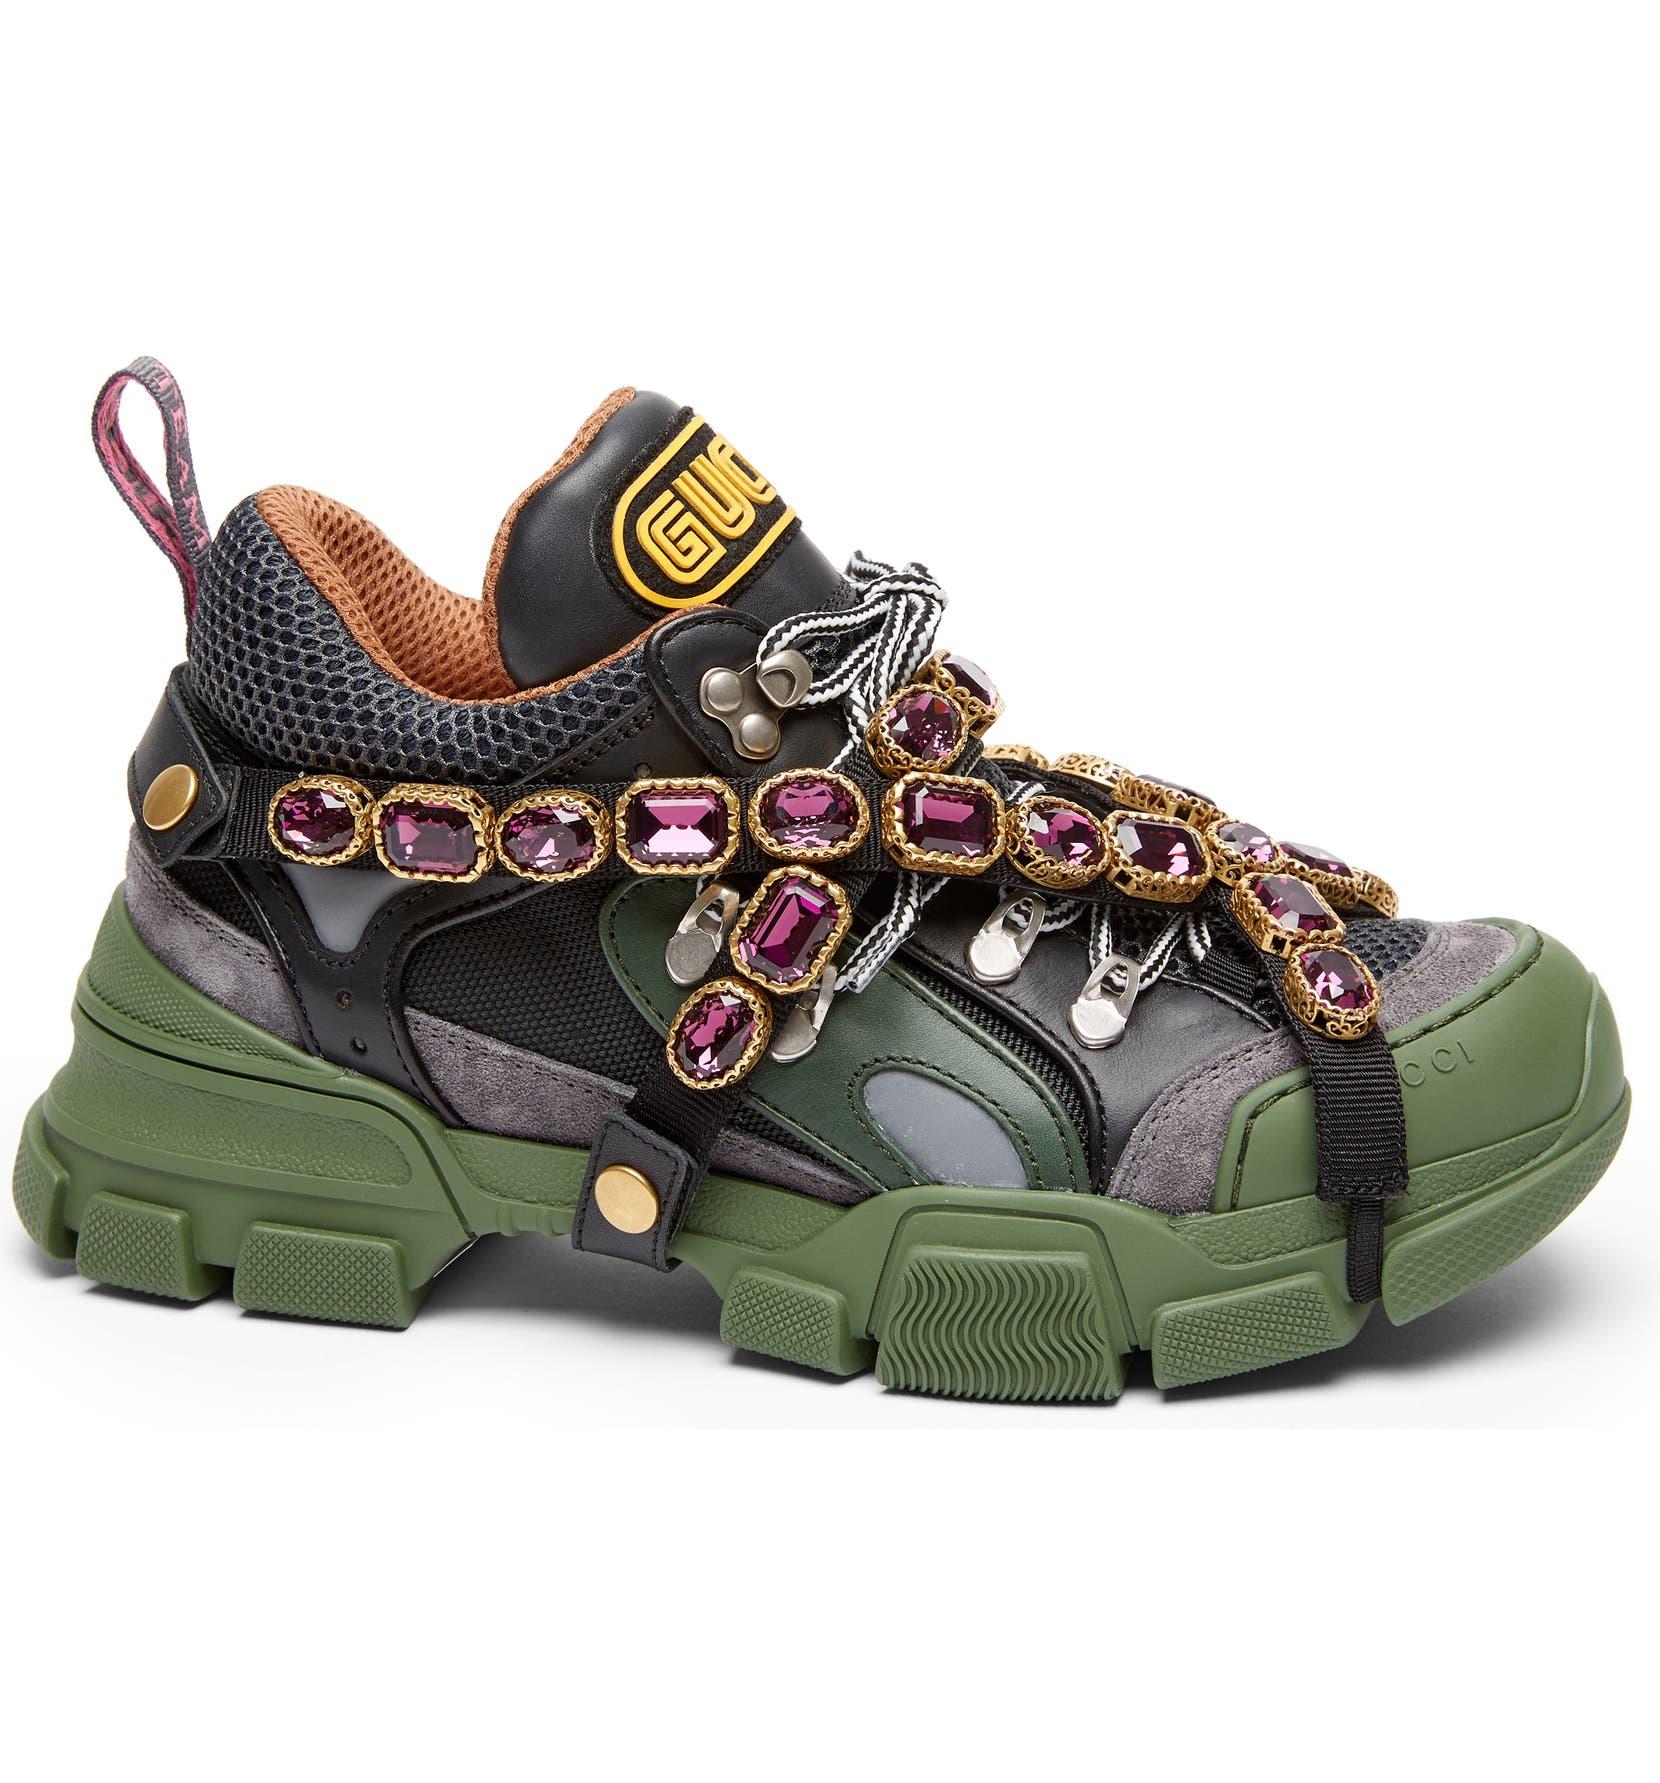 76d8f8c4 Gucci Flashtrek Jewel Sneaker (Women) | Nordstrom